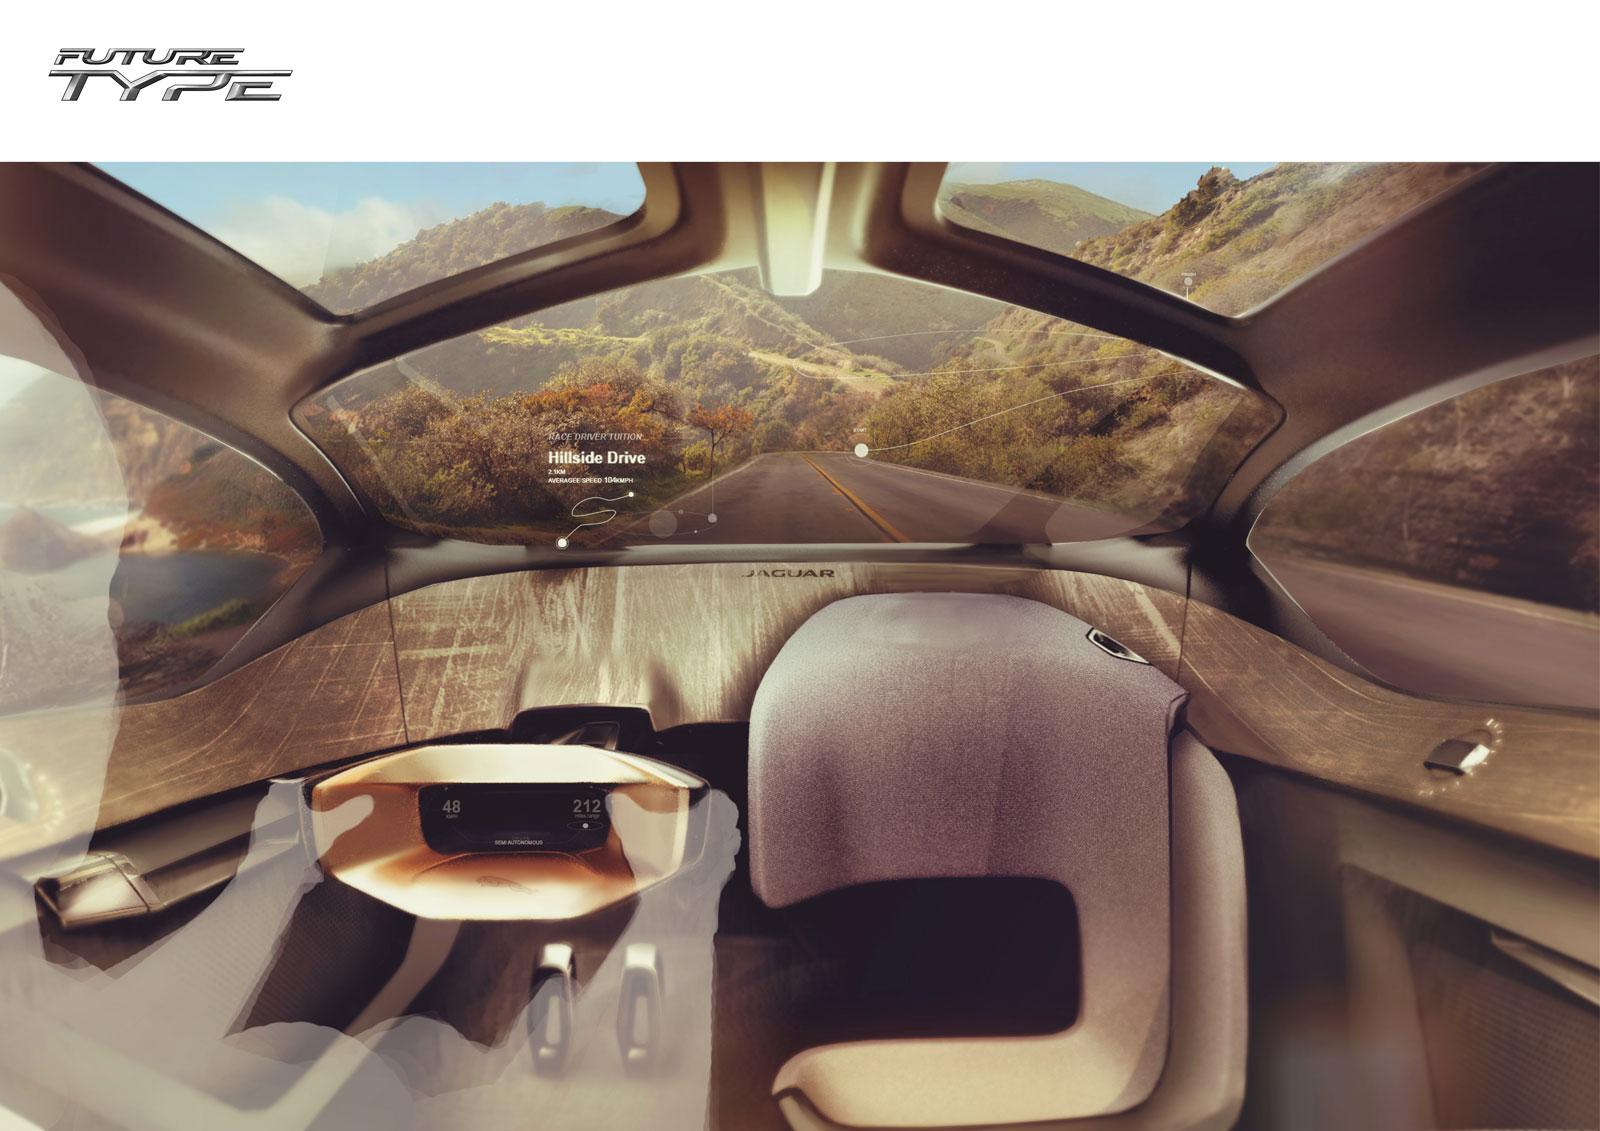 Enjoyable Jaguar Future Type Concept Interior Design Render Car Body Interior Design Ideas Tzicisoteloinfo